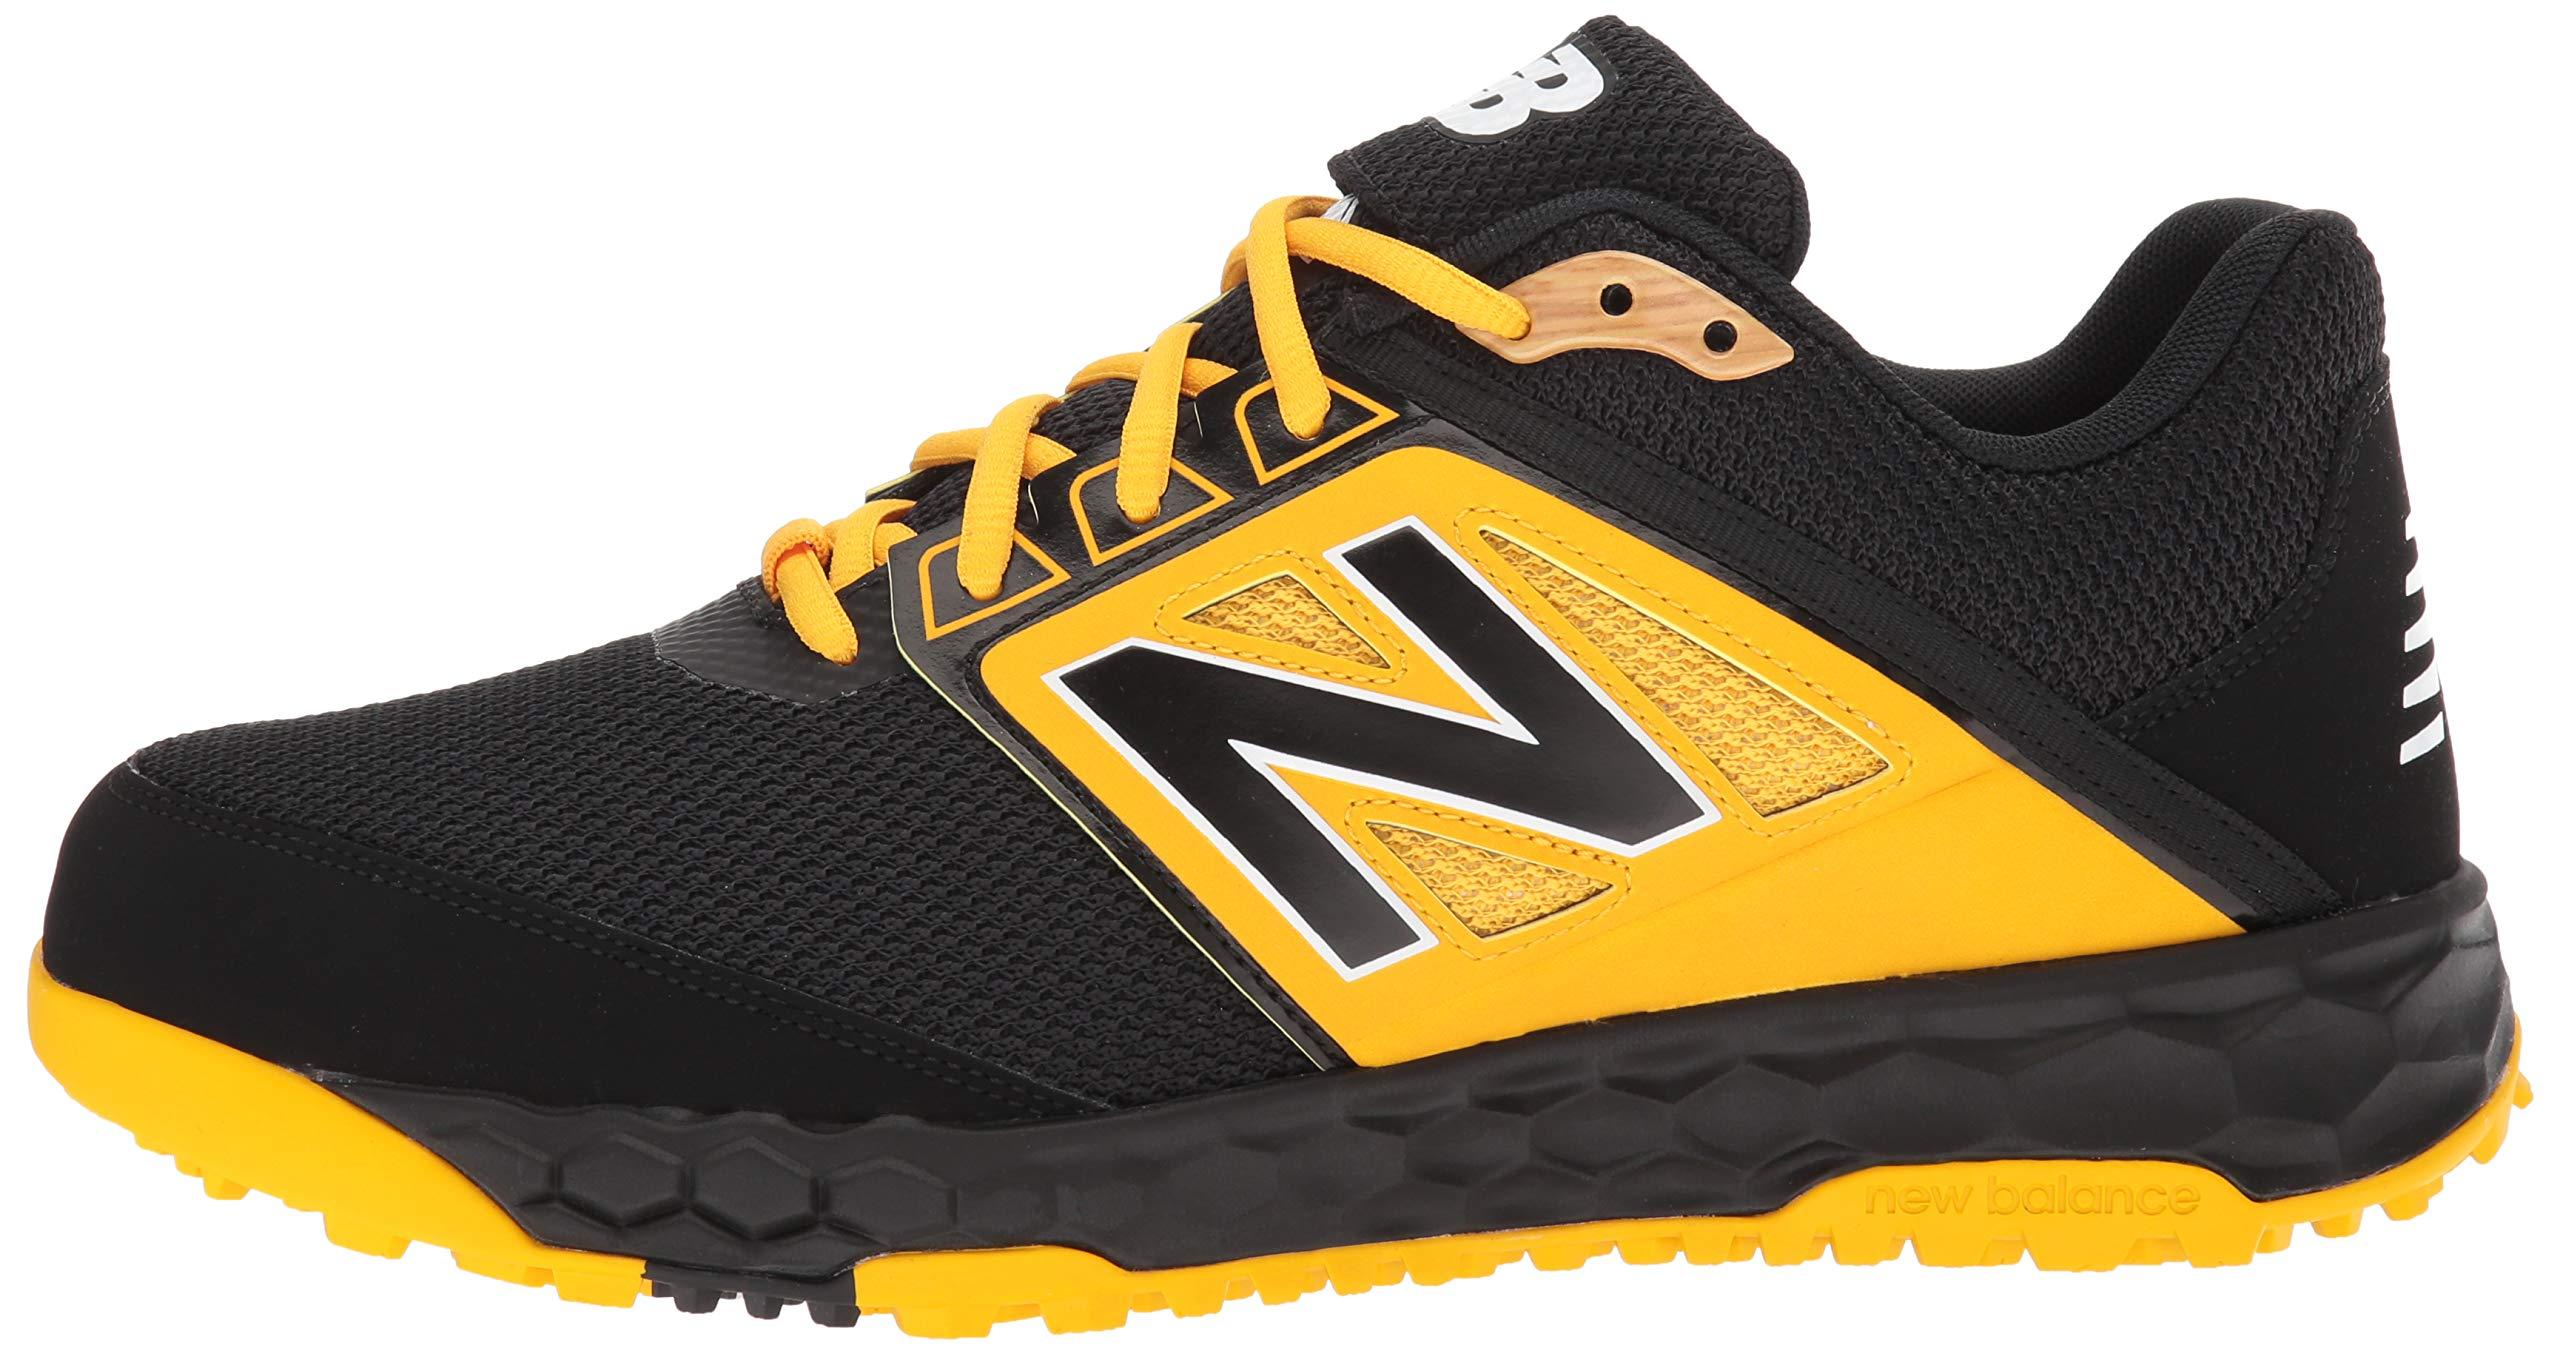 New Balance Men's 3000v4 Turf Baseball Shoe, Black/Yellow, 5 D US by New Balance (Image #5)